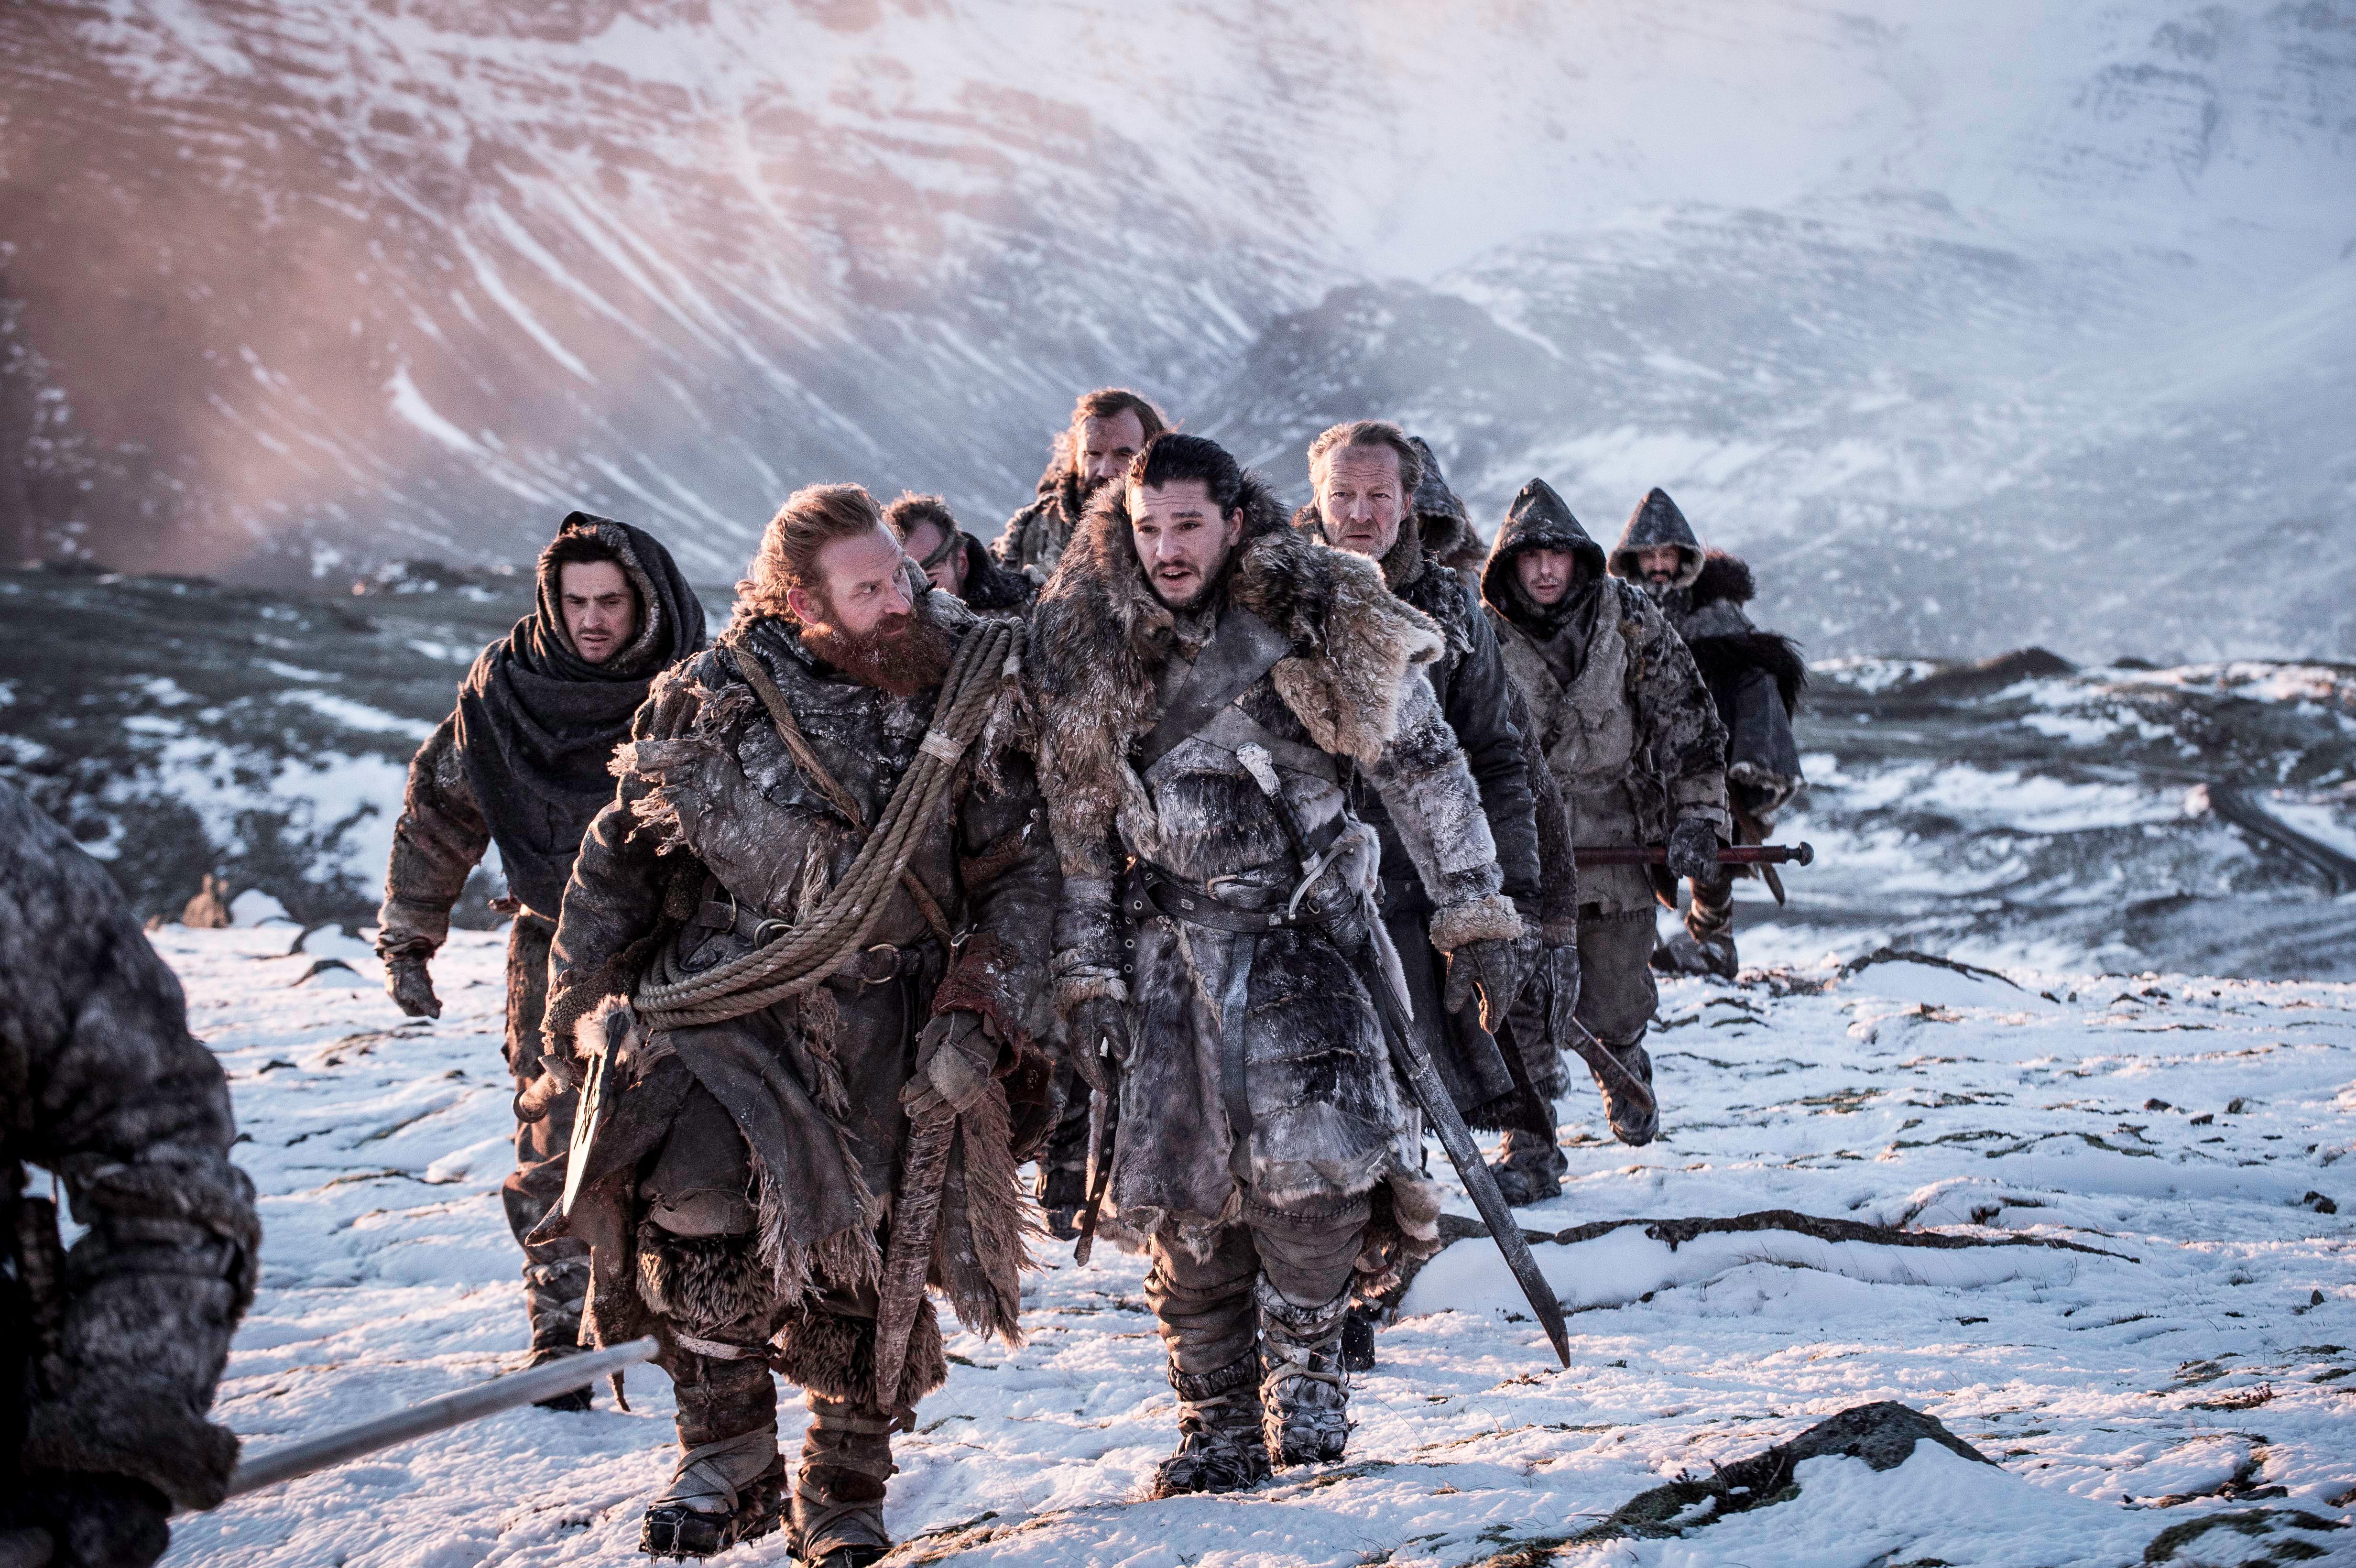 Game Of Thrones Season 6 Wallpapers: Game Of Thrones Season 7 Ep. 6 Wallpaper, HD Movies 4K